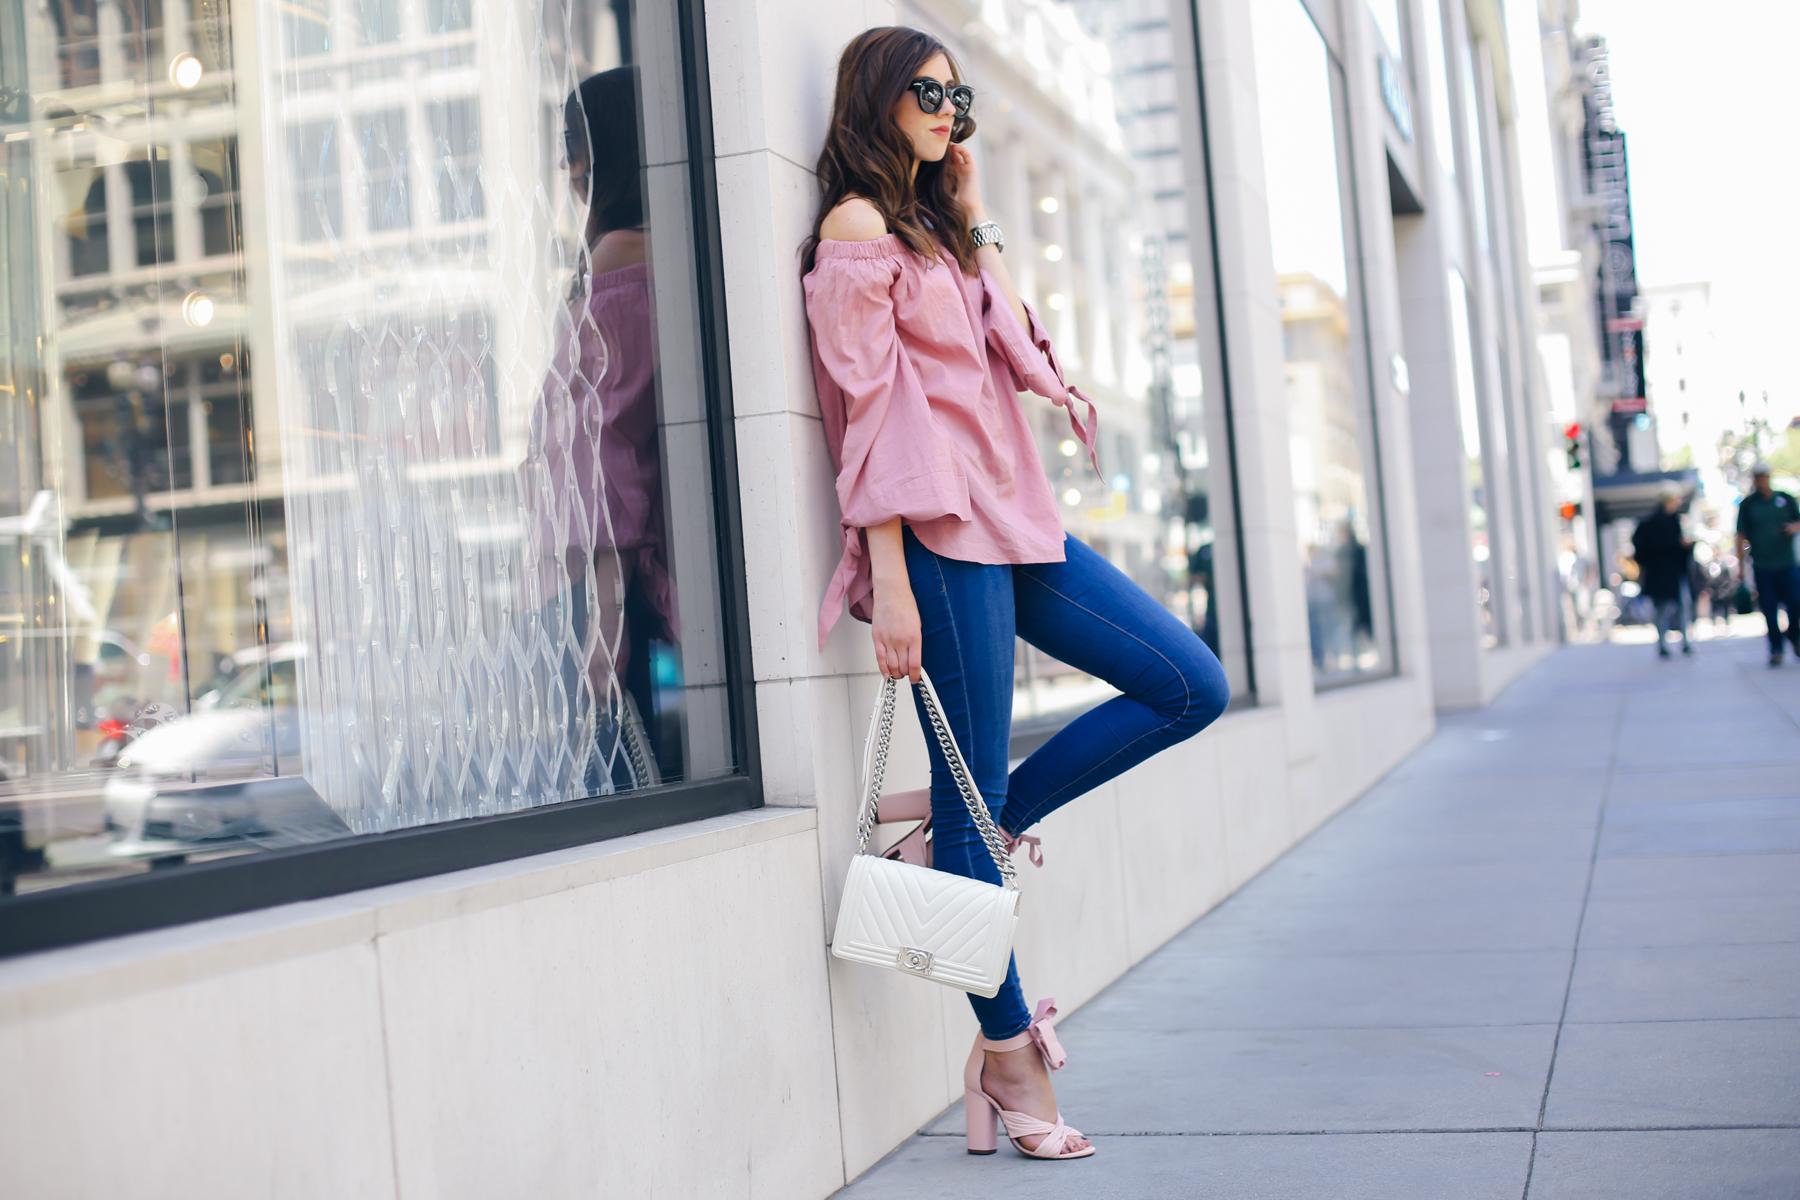 Barbora-Ondracova-FashioninmySoul-Fashion-Blogger-Photography-RyanbyRyanChua-7384